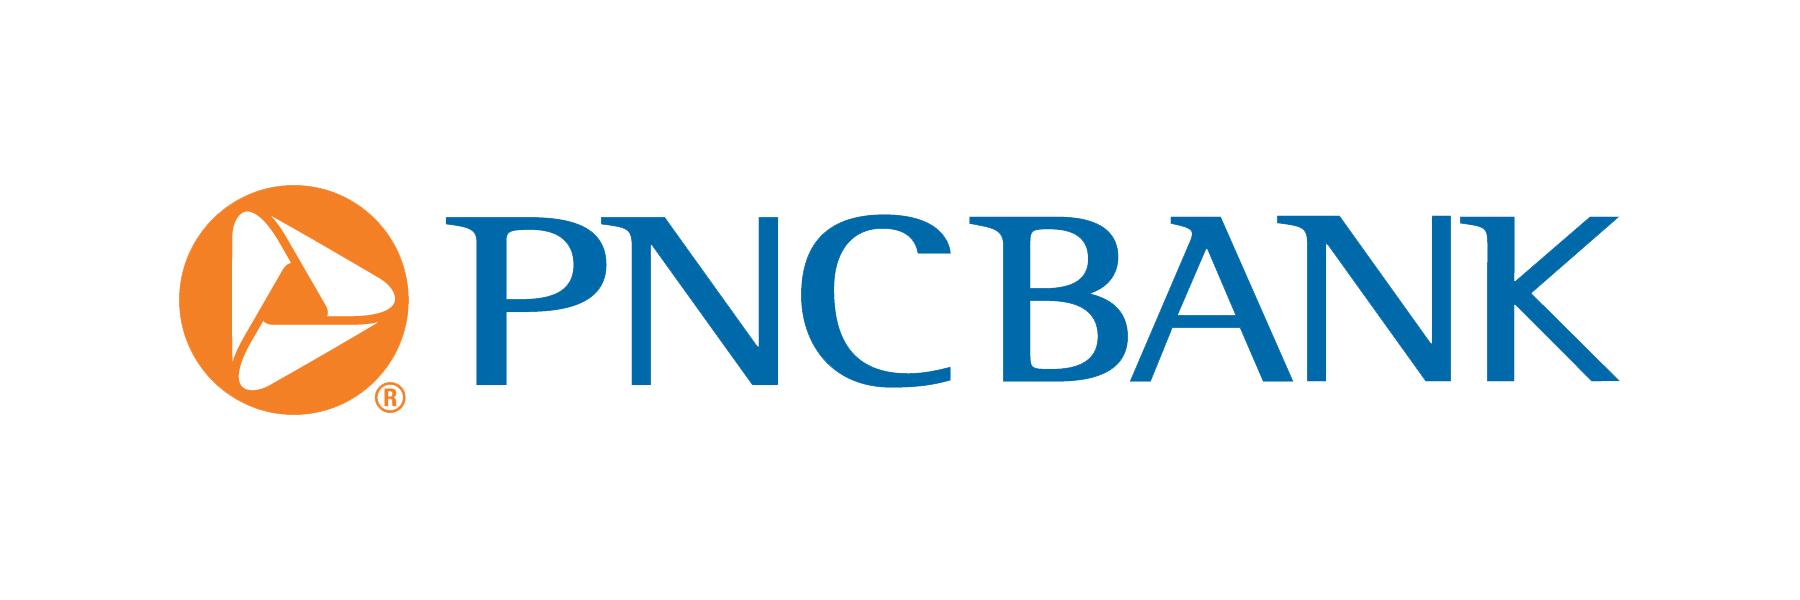 PNC_BANK_4C_No_Tag.png